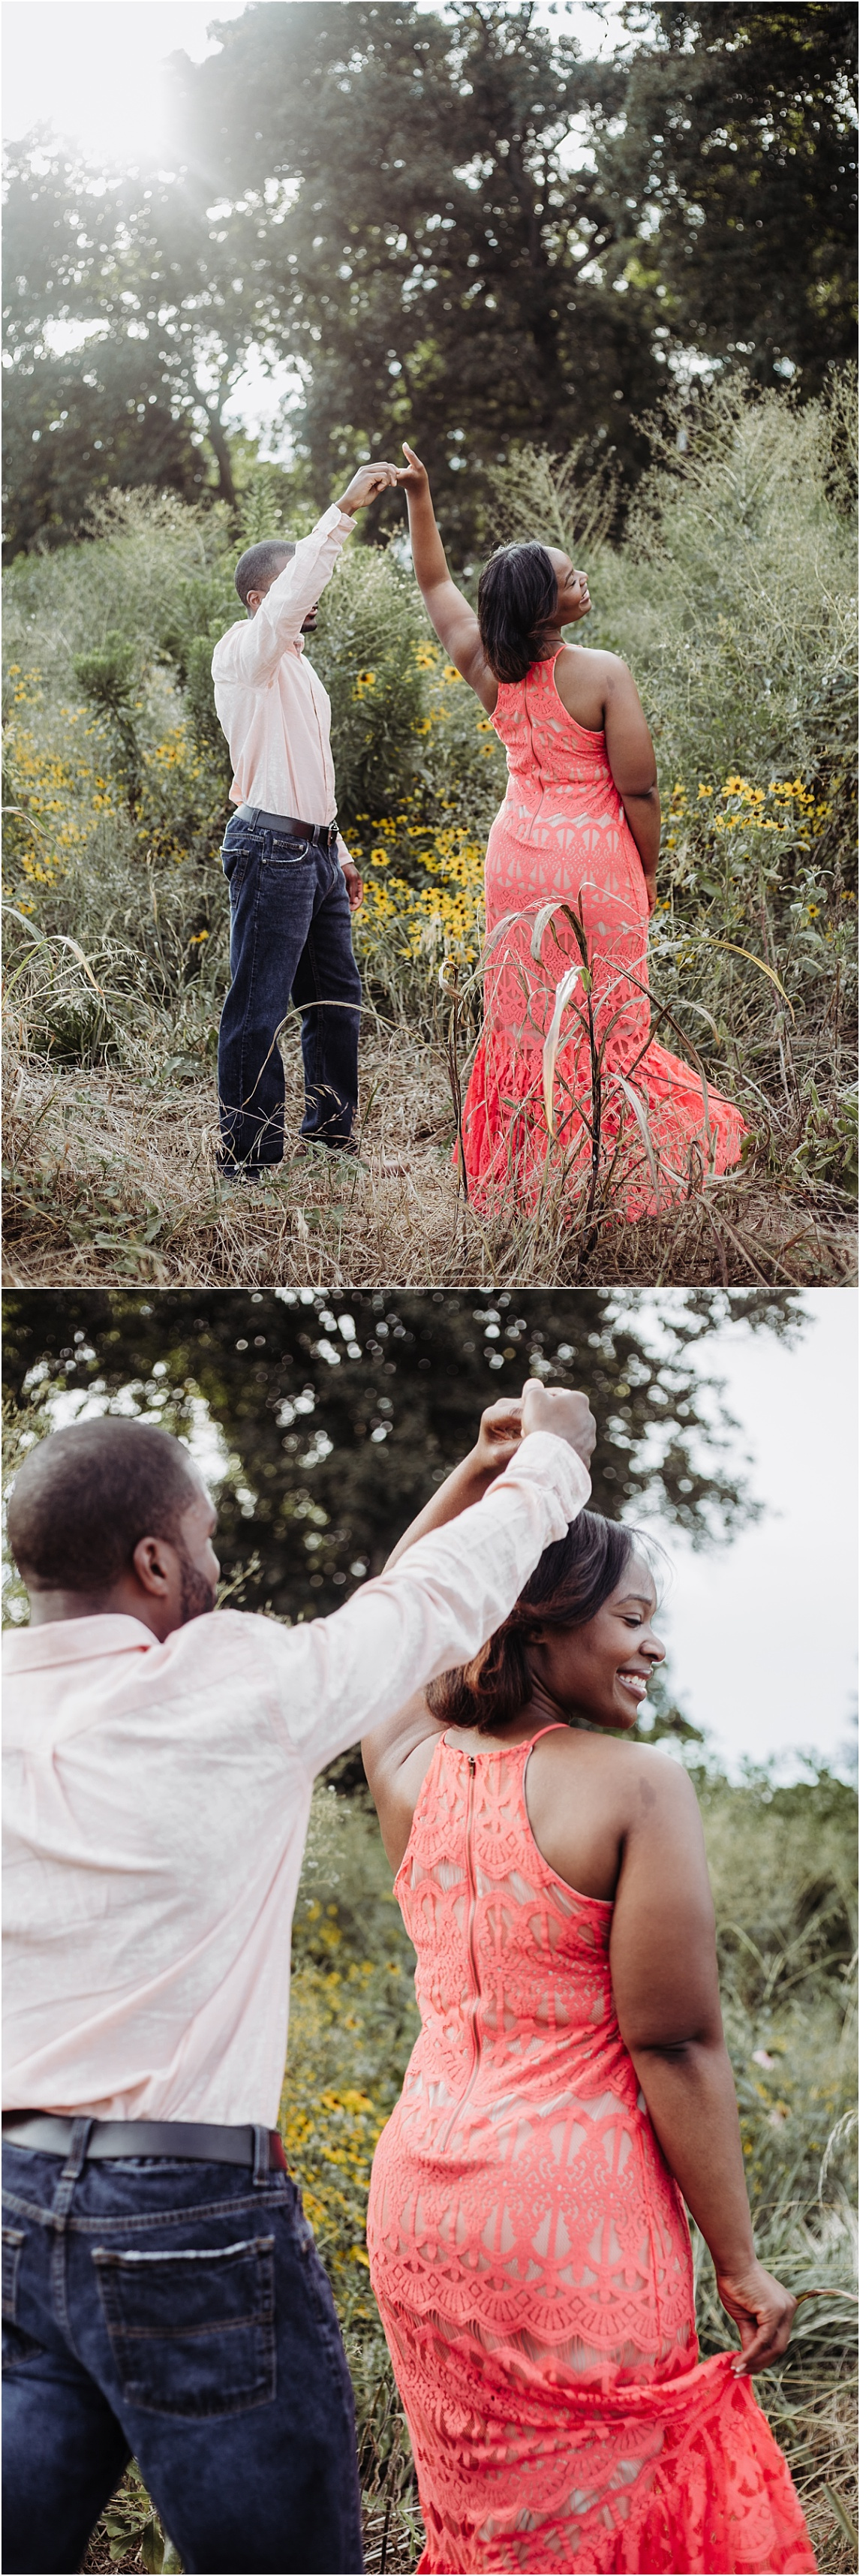 Posh-Moments-Photography-NC- Wedding-Photographer-Rolling-Hills-Farms-Wedding-Monroe-NC-Charlotte-NC_0045.jpg